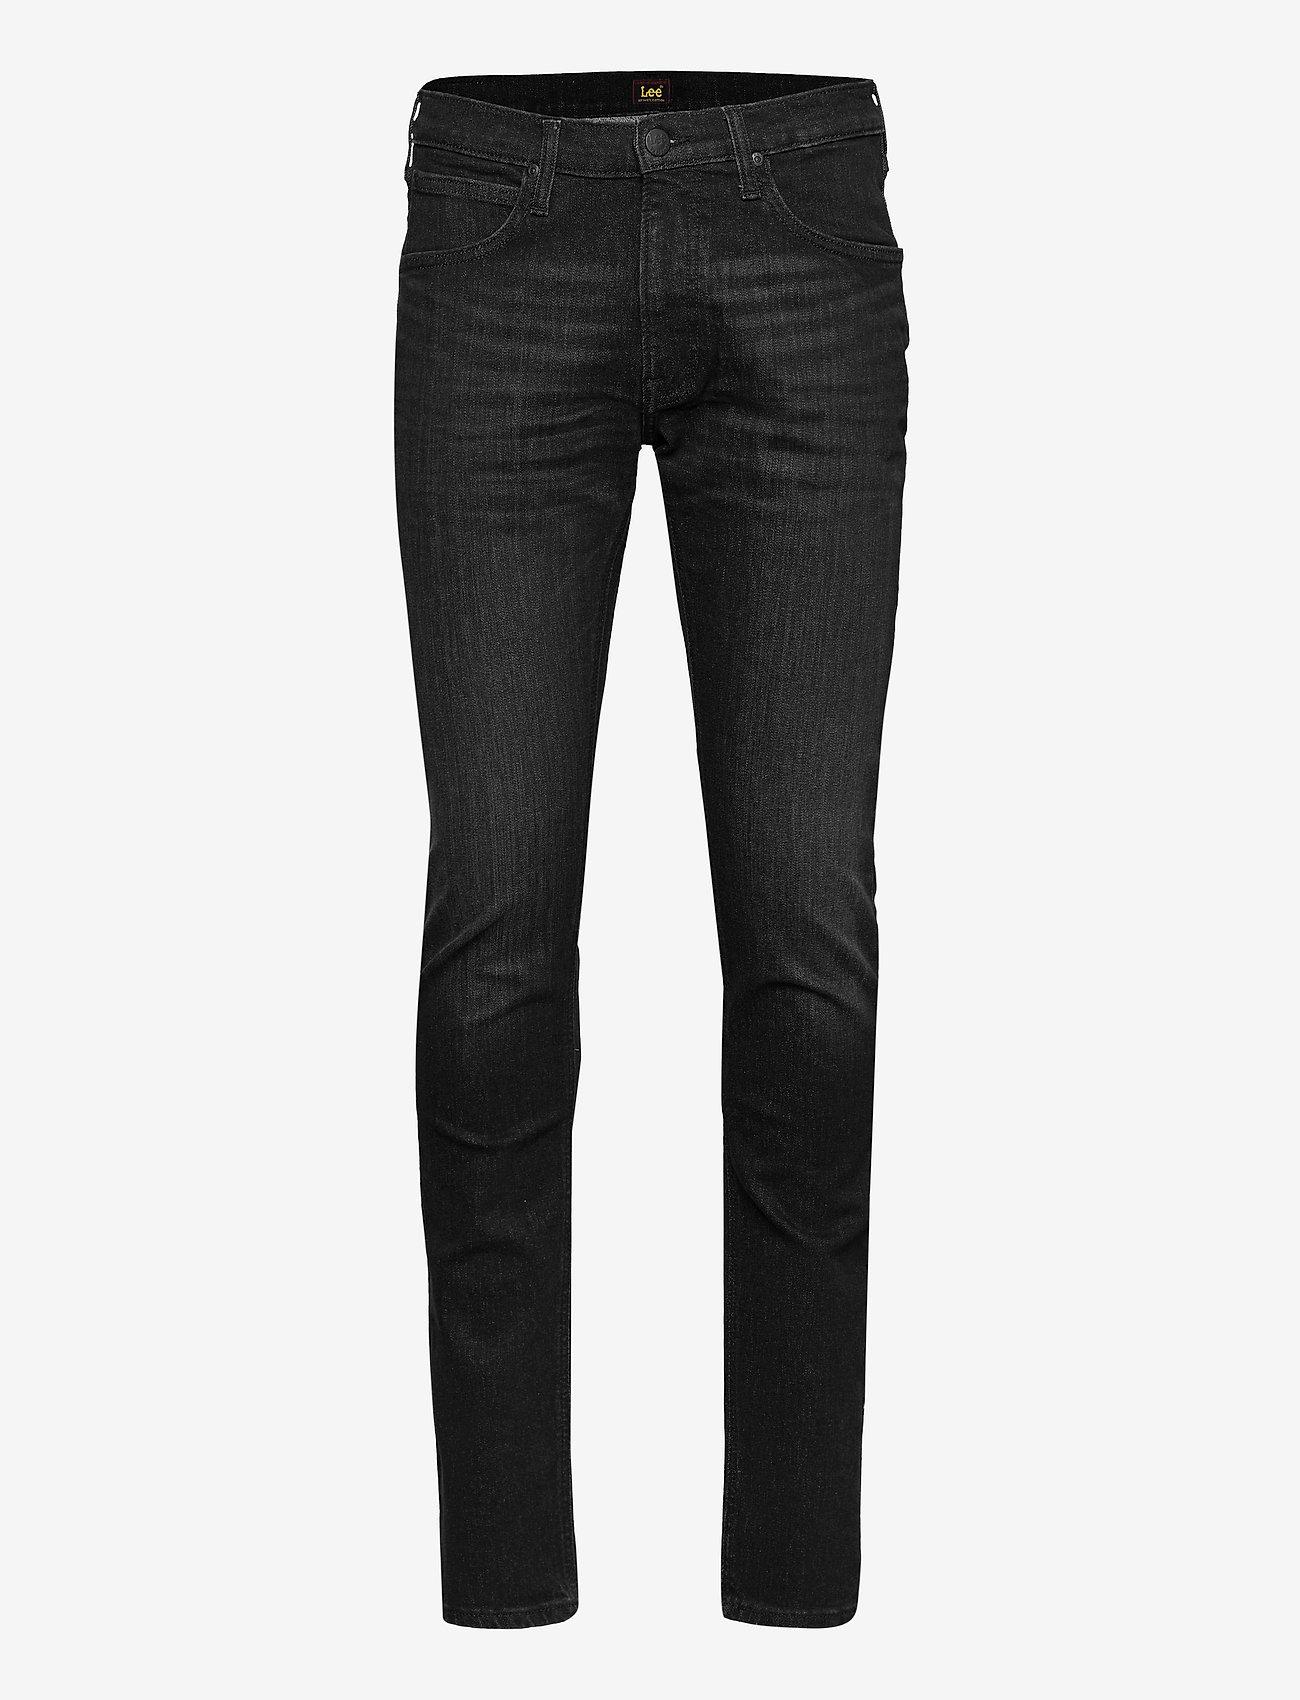 Lee Jeans - LUKE - slim jeans - worn magnet - 0